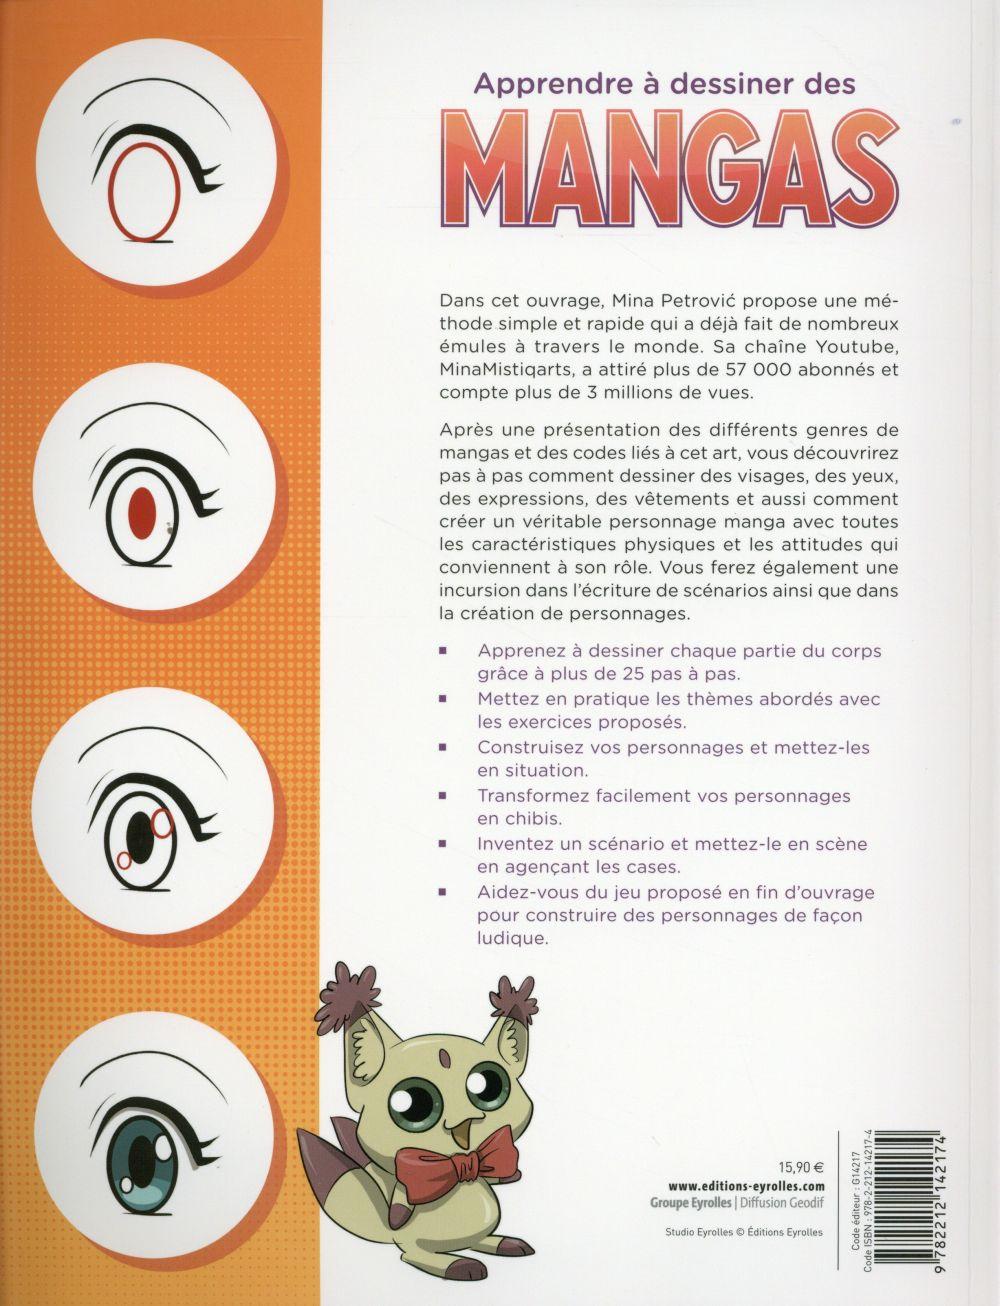 Apprendre A Dessiner Manga Pas A Pas : apprendre, dessiner, manga, Apprendre, Dessiner, Mangas, Petrovic, Eyrolles, Grand, Format, Livre, NANCY